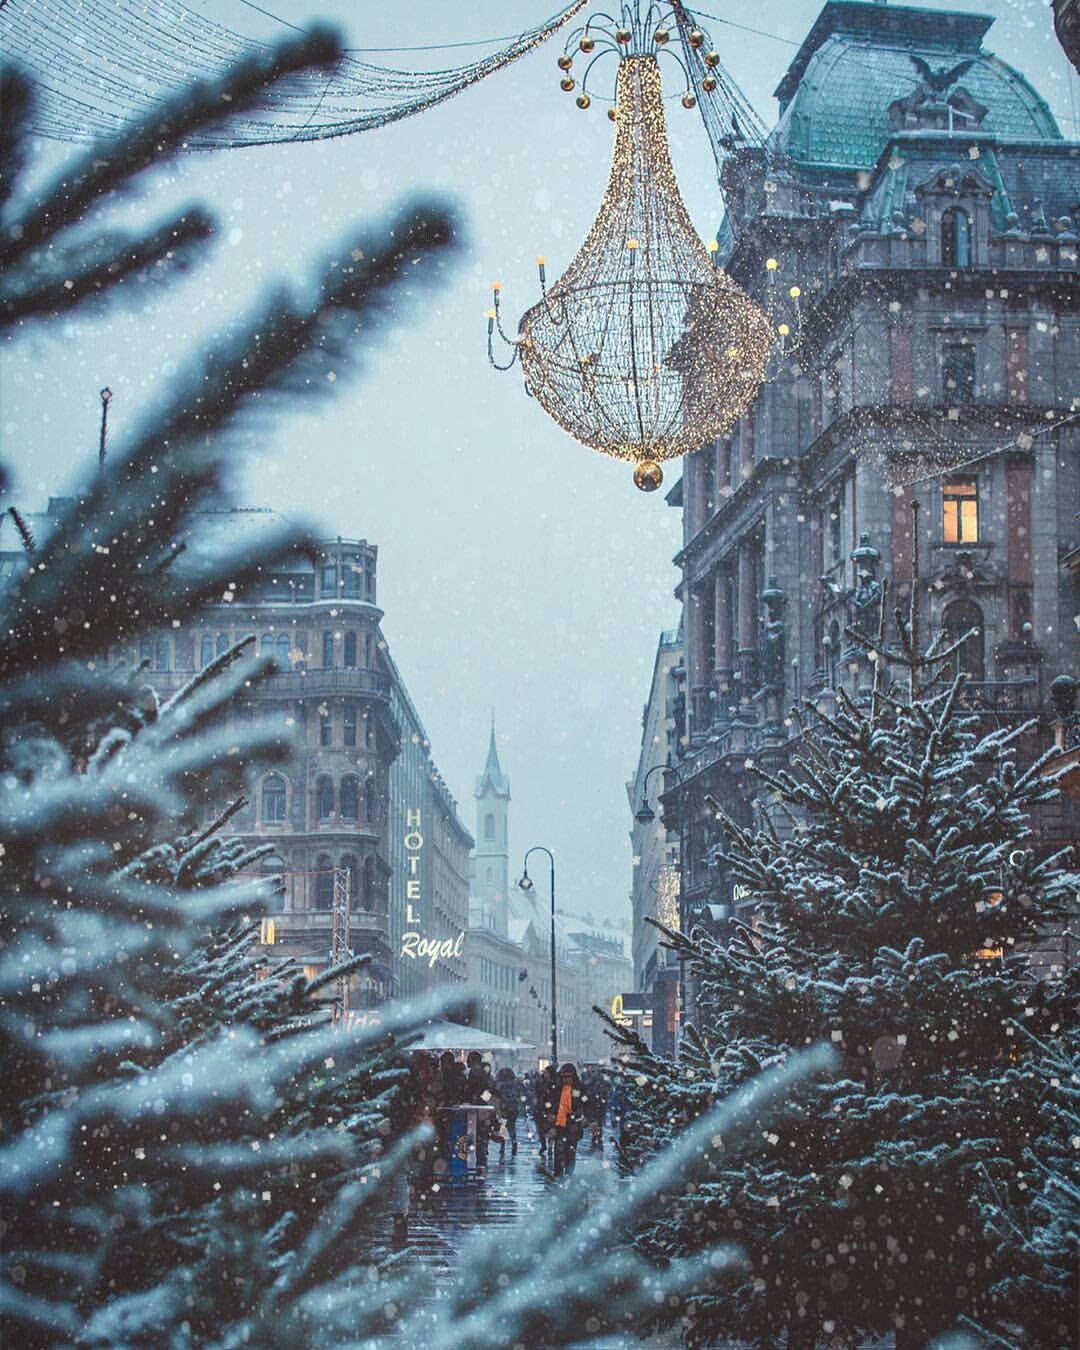 Weihnachten in Wien | Städtetrip nach Wien #Reise #Stadttrip #Wien #kerst #ideas #ideeen